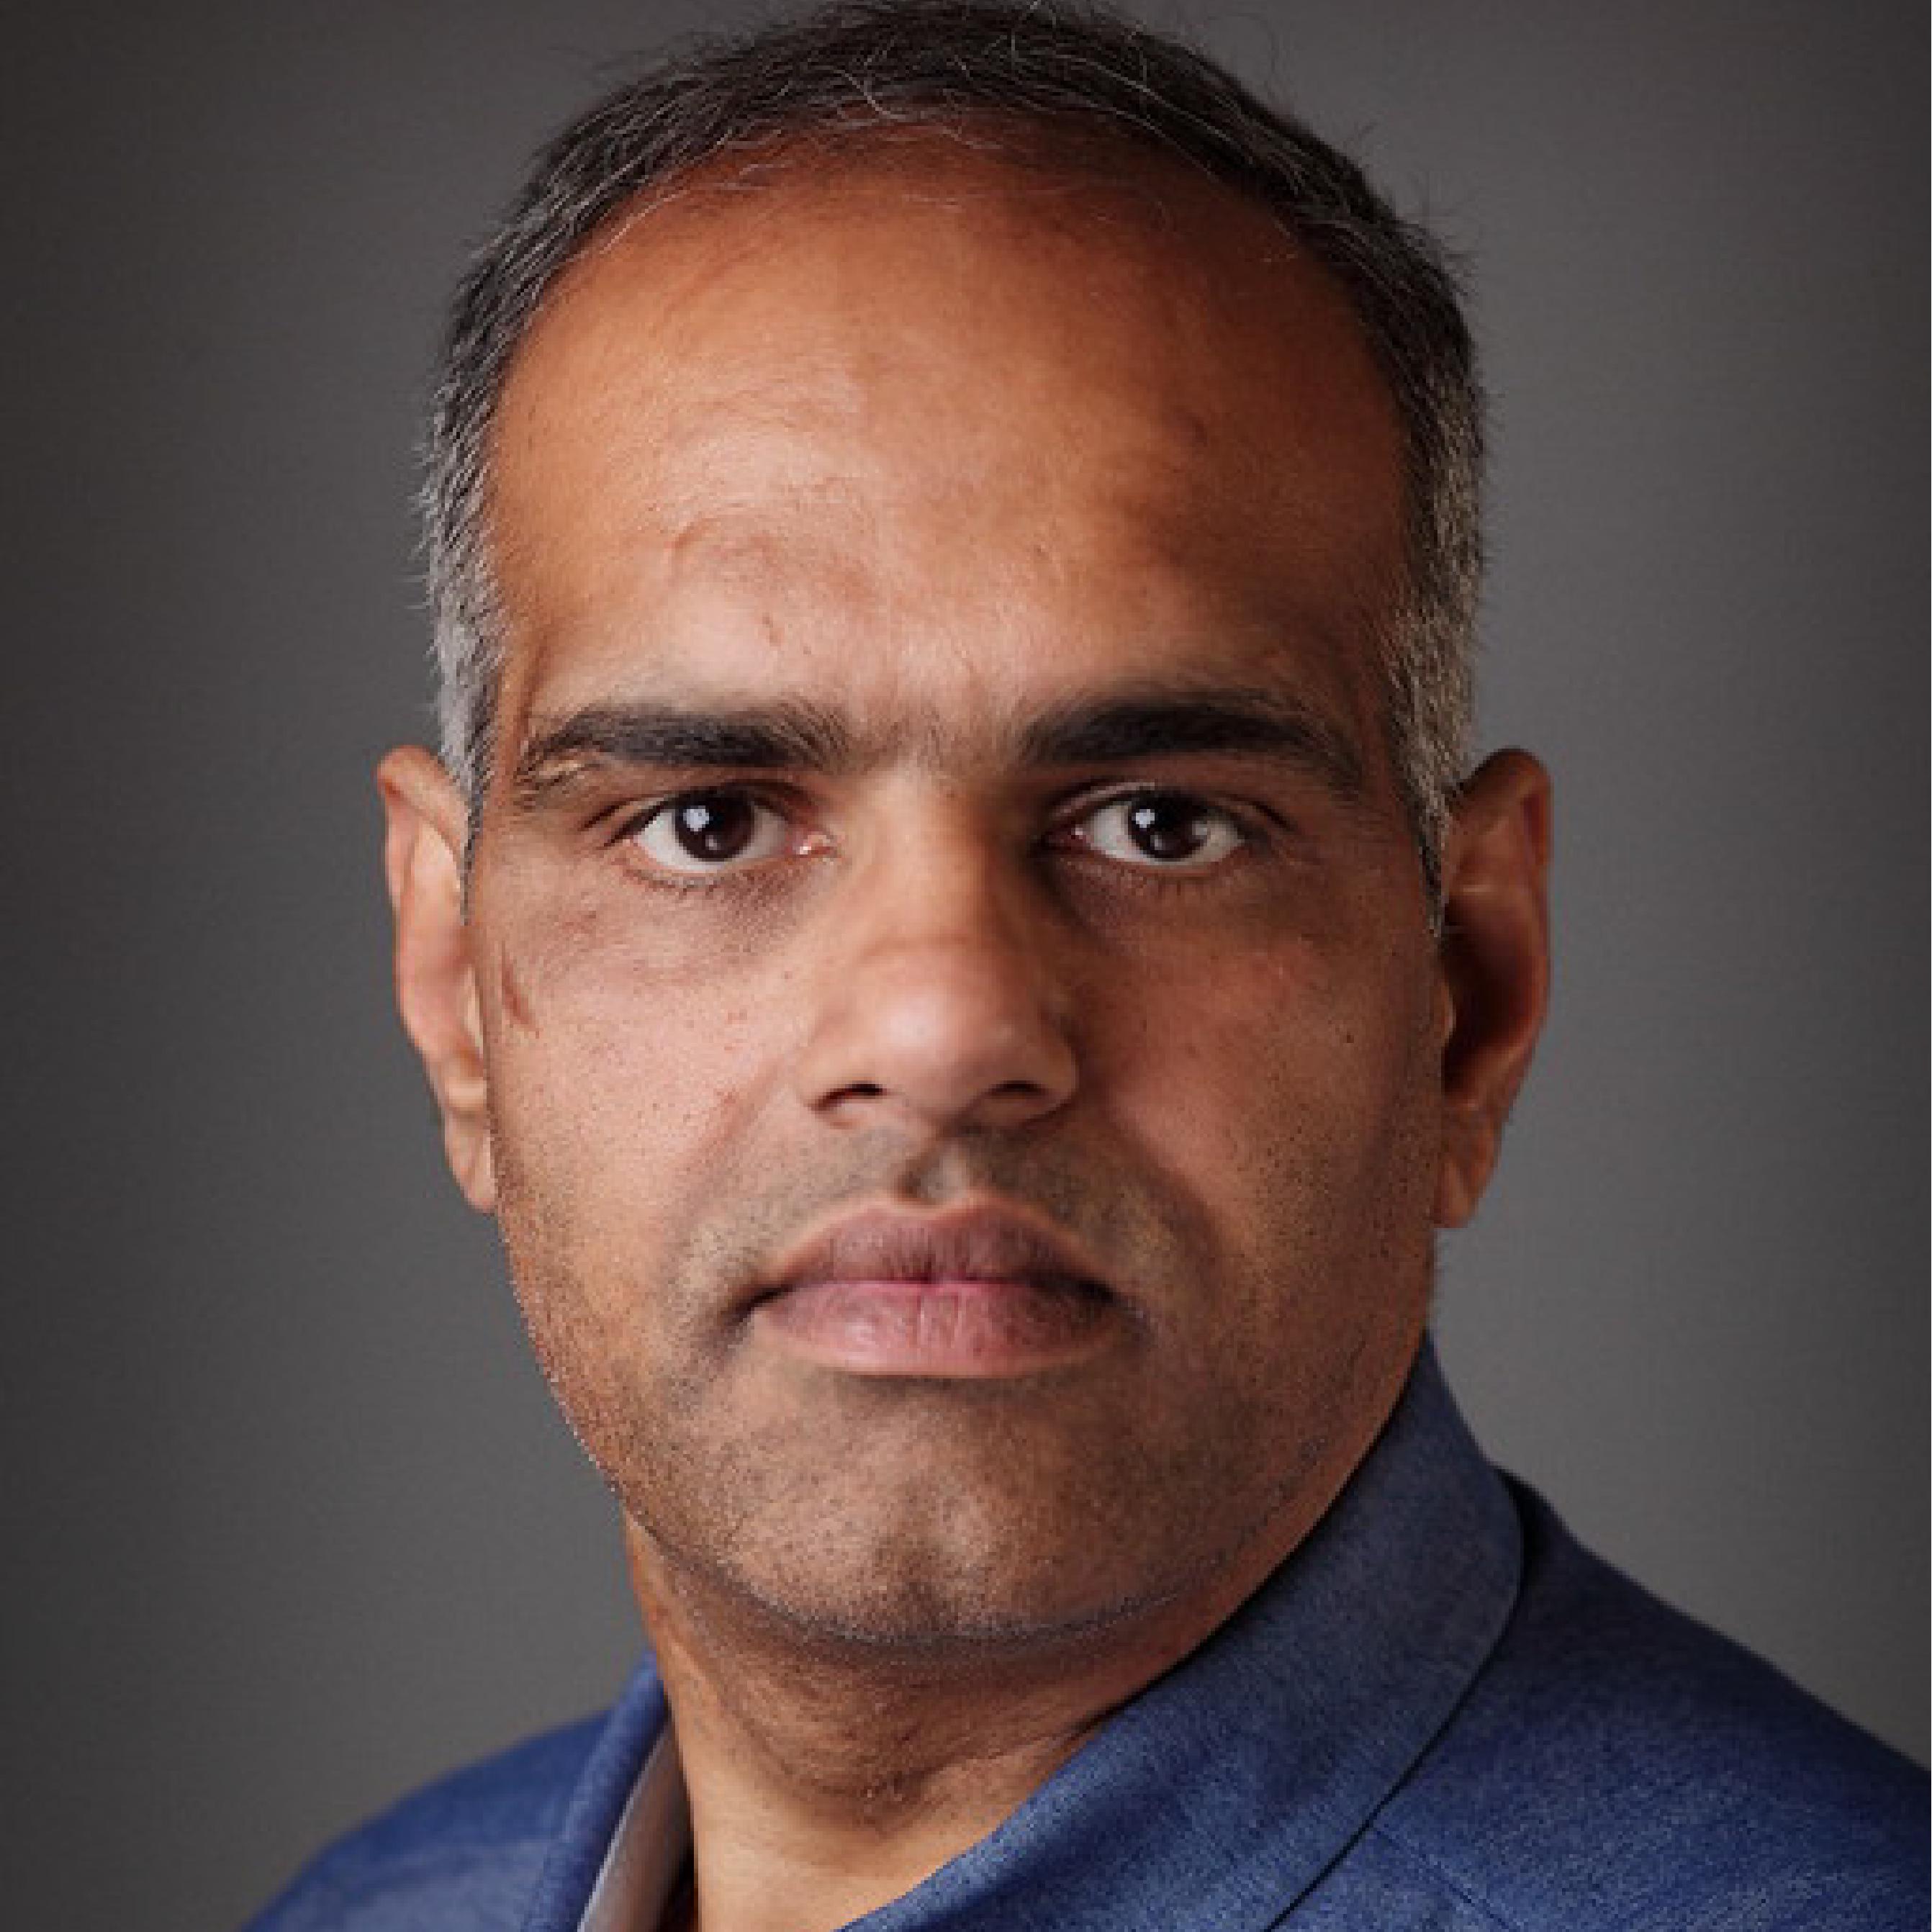 Shankar Vasudevan